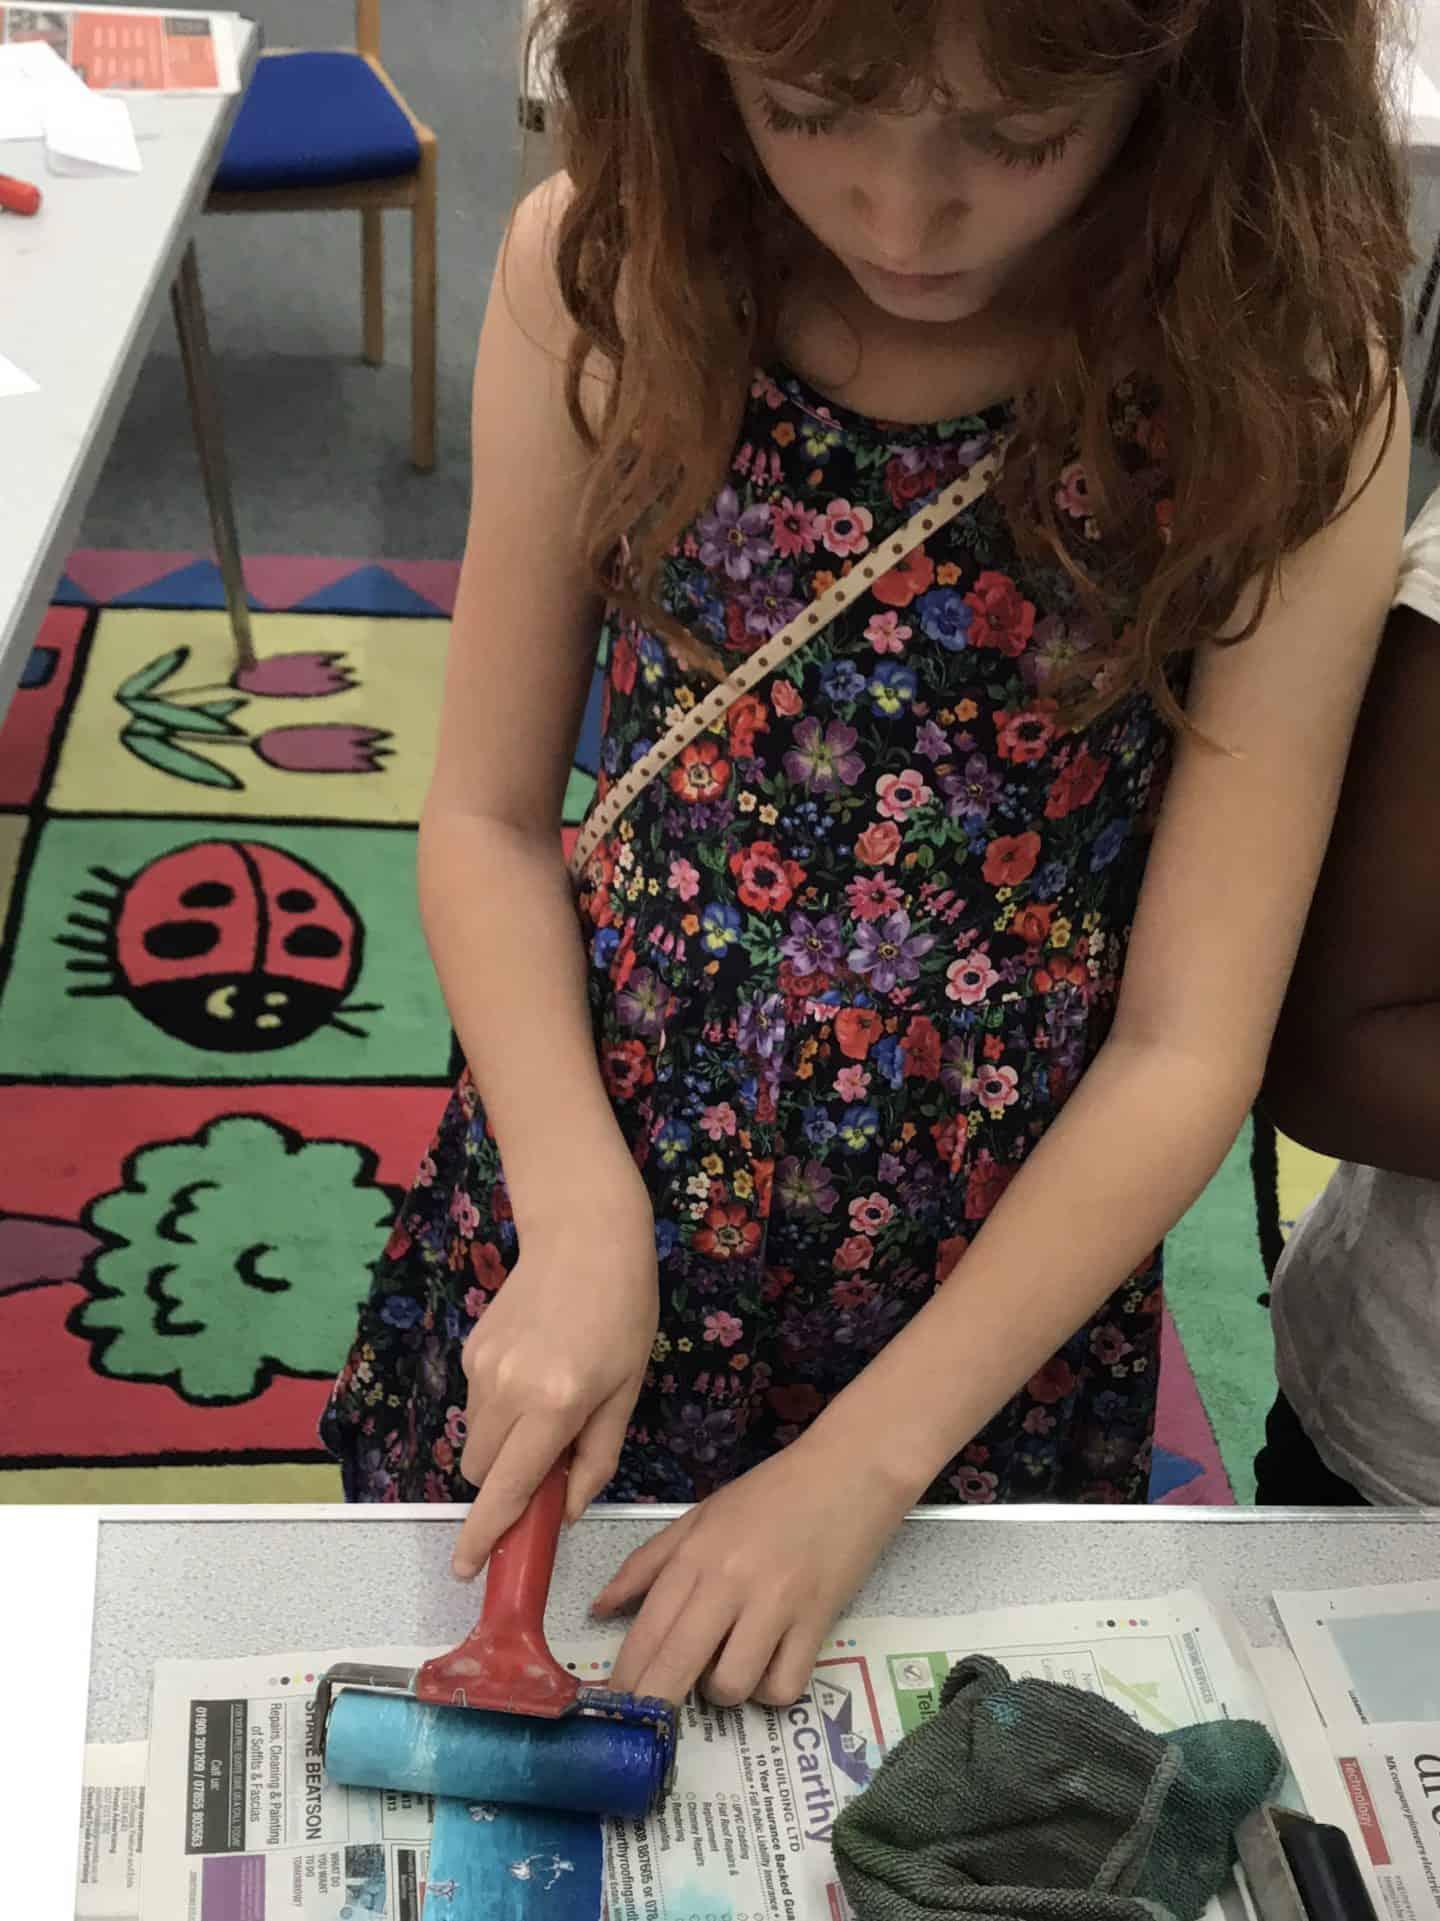 Inking up her polystyrene design